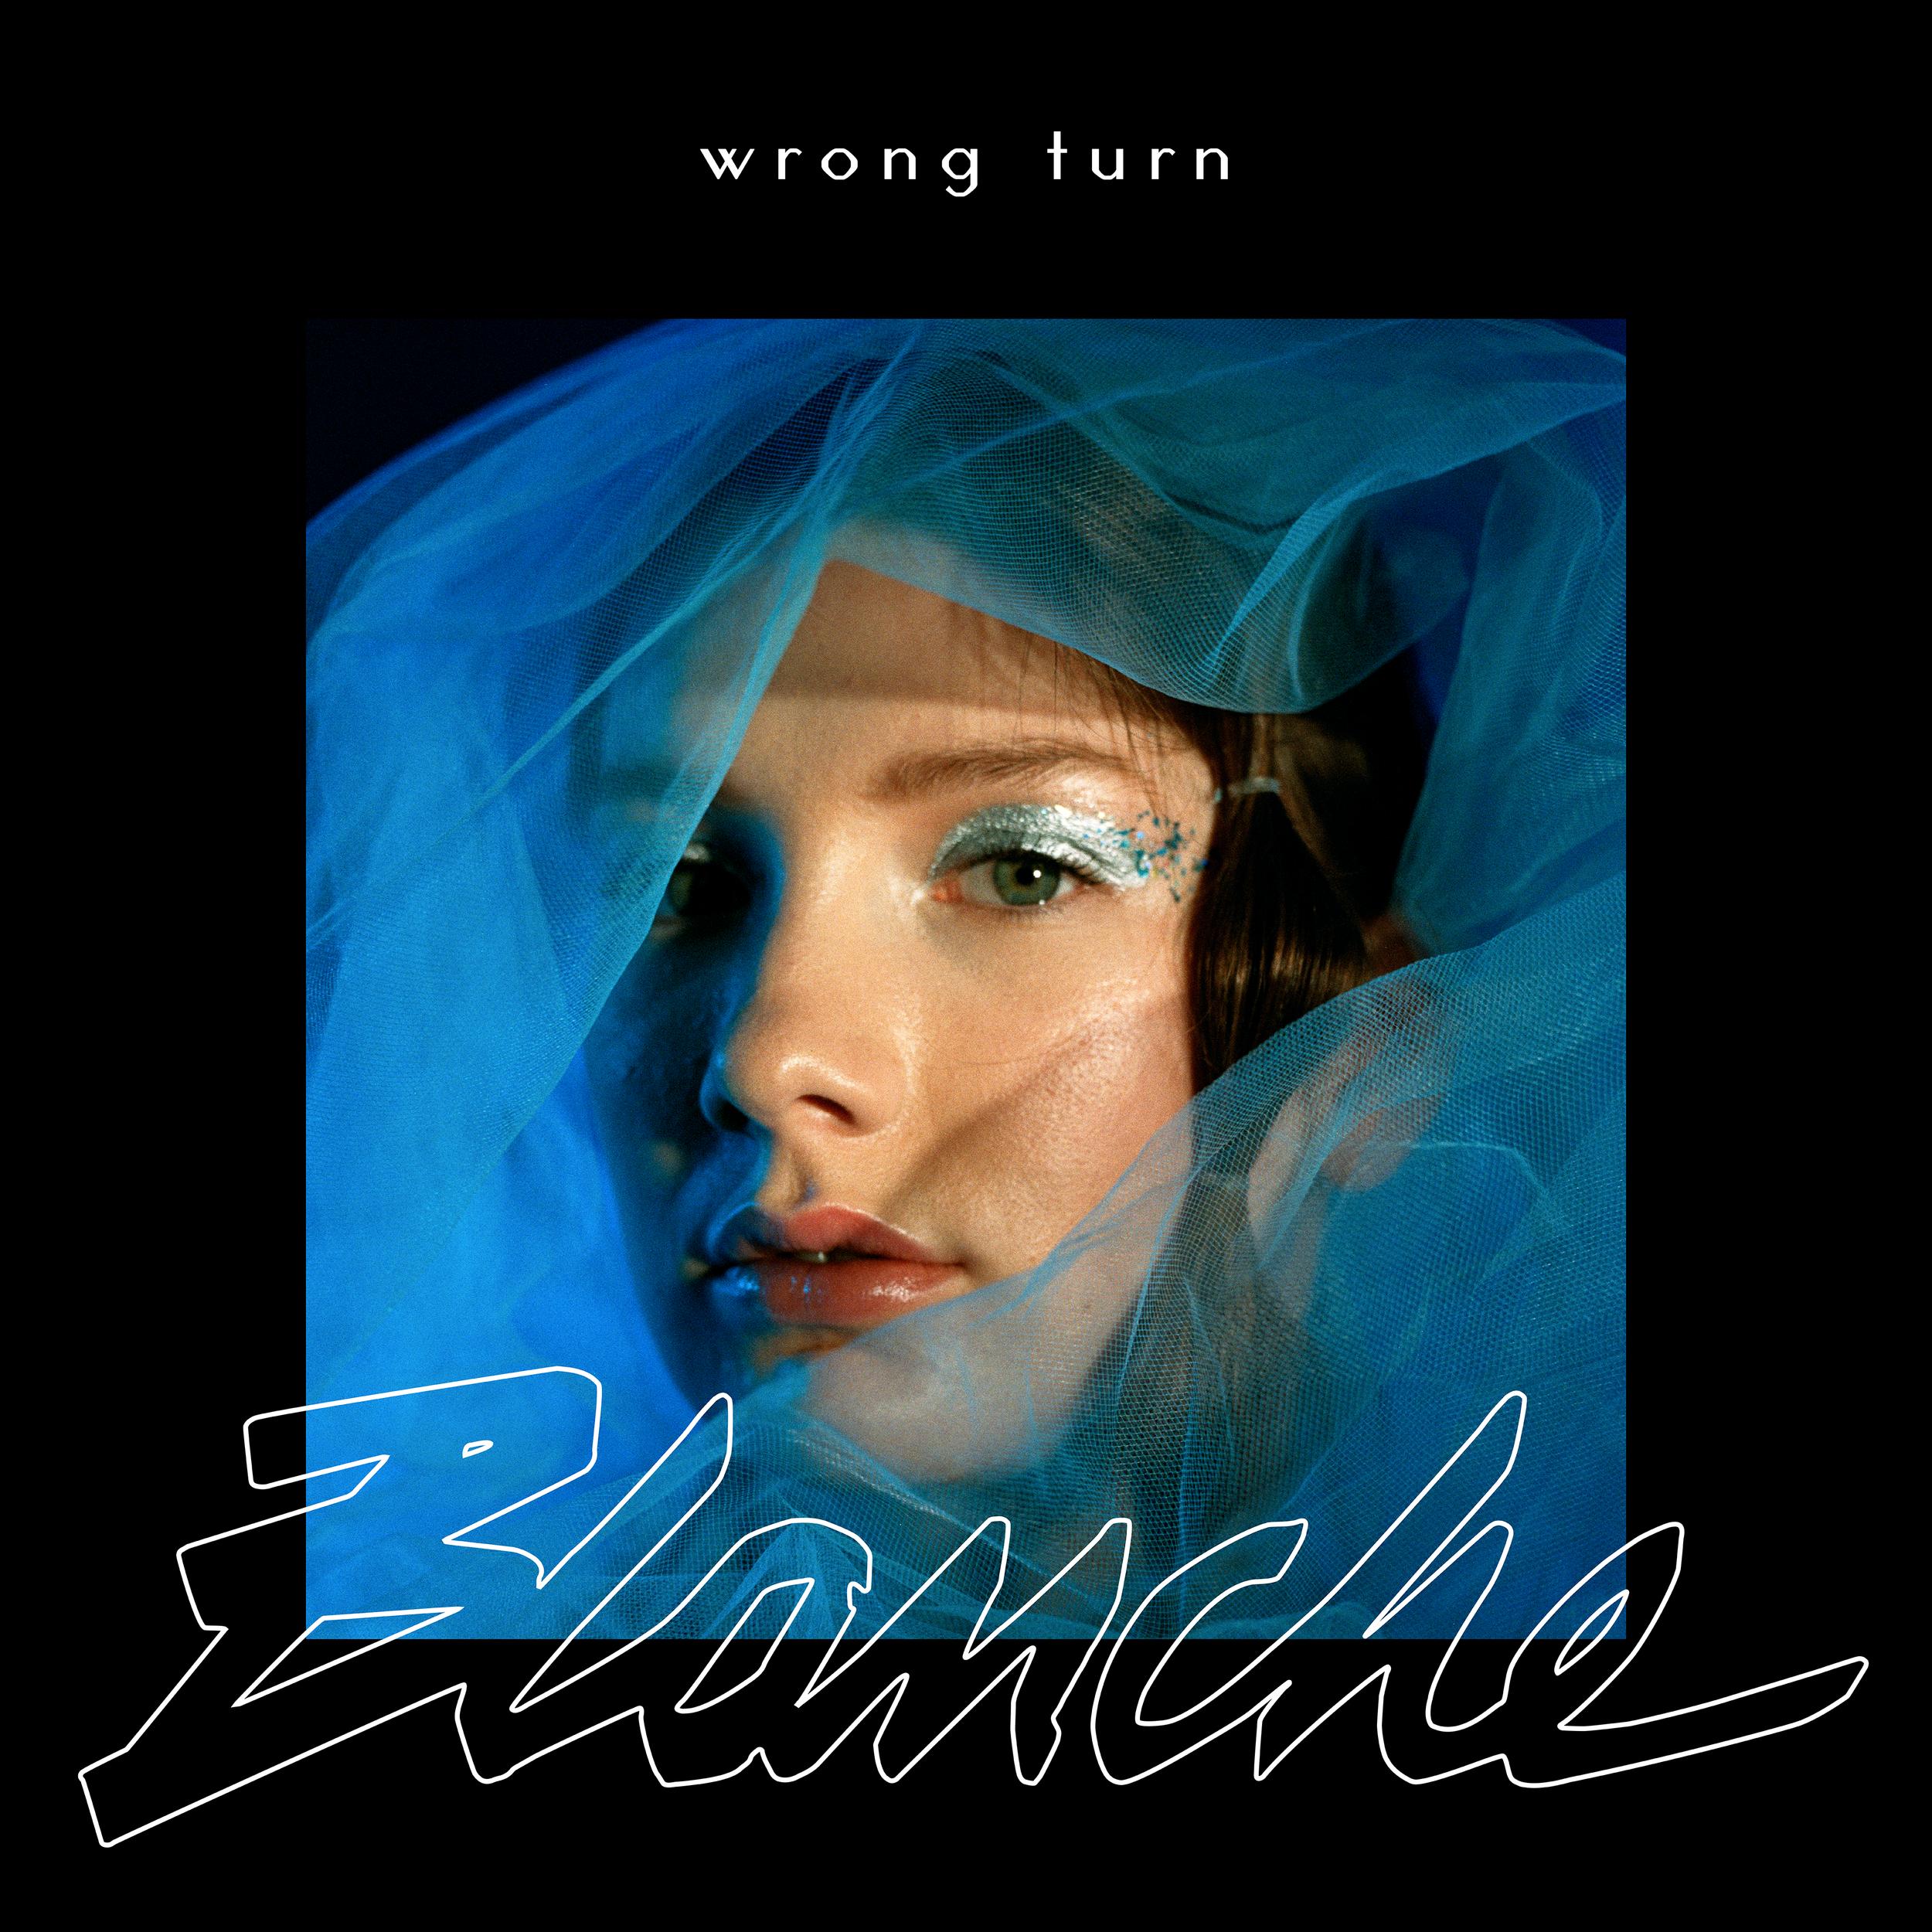 blanche_Wrong Turn packshot.png